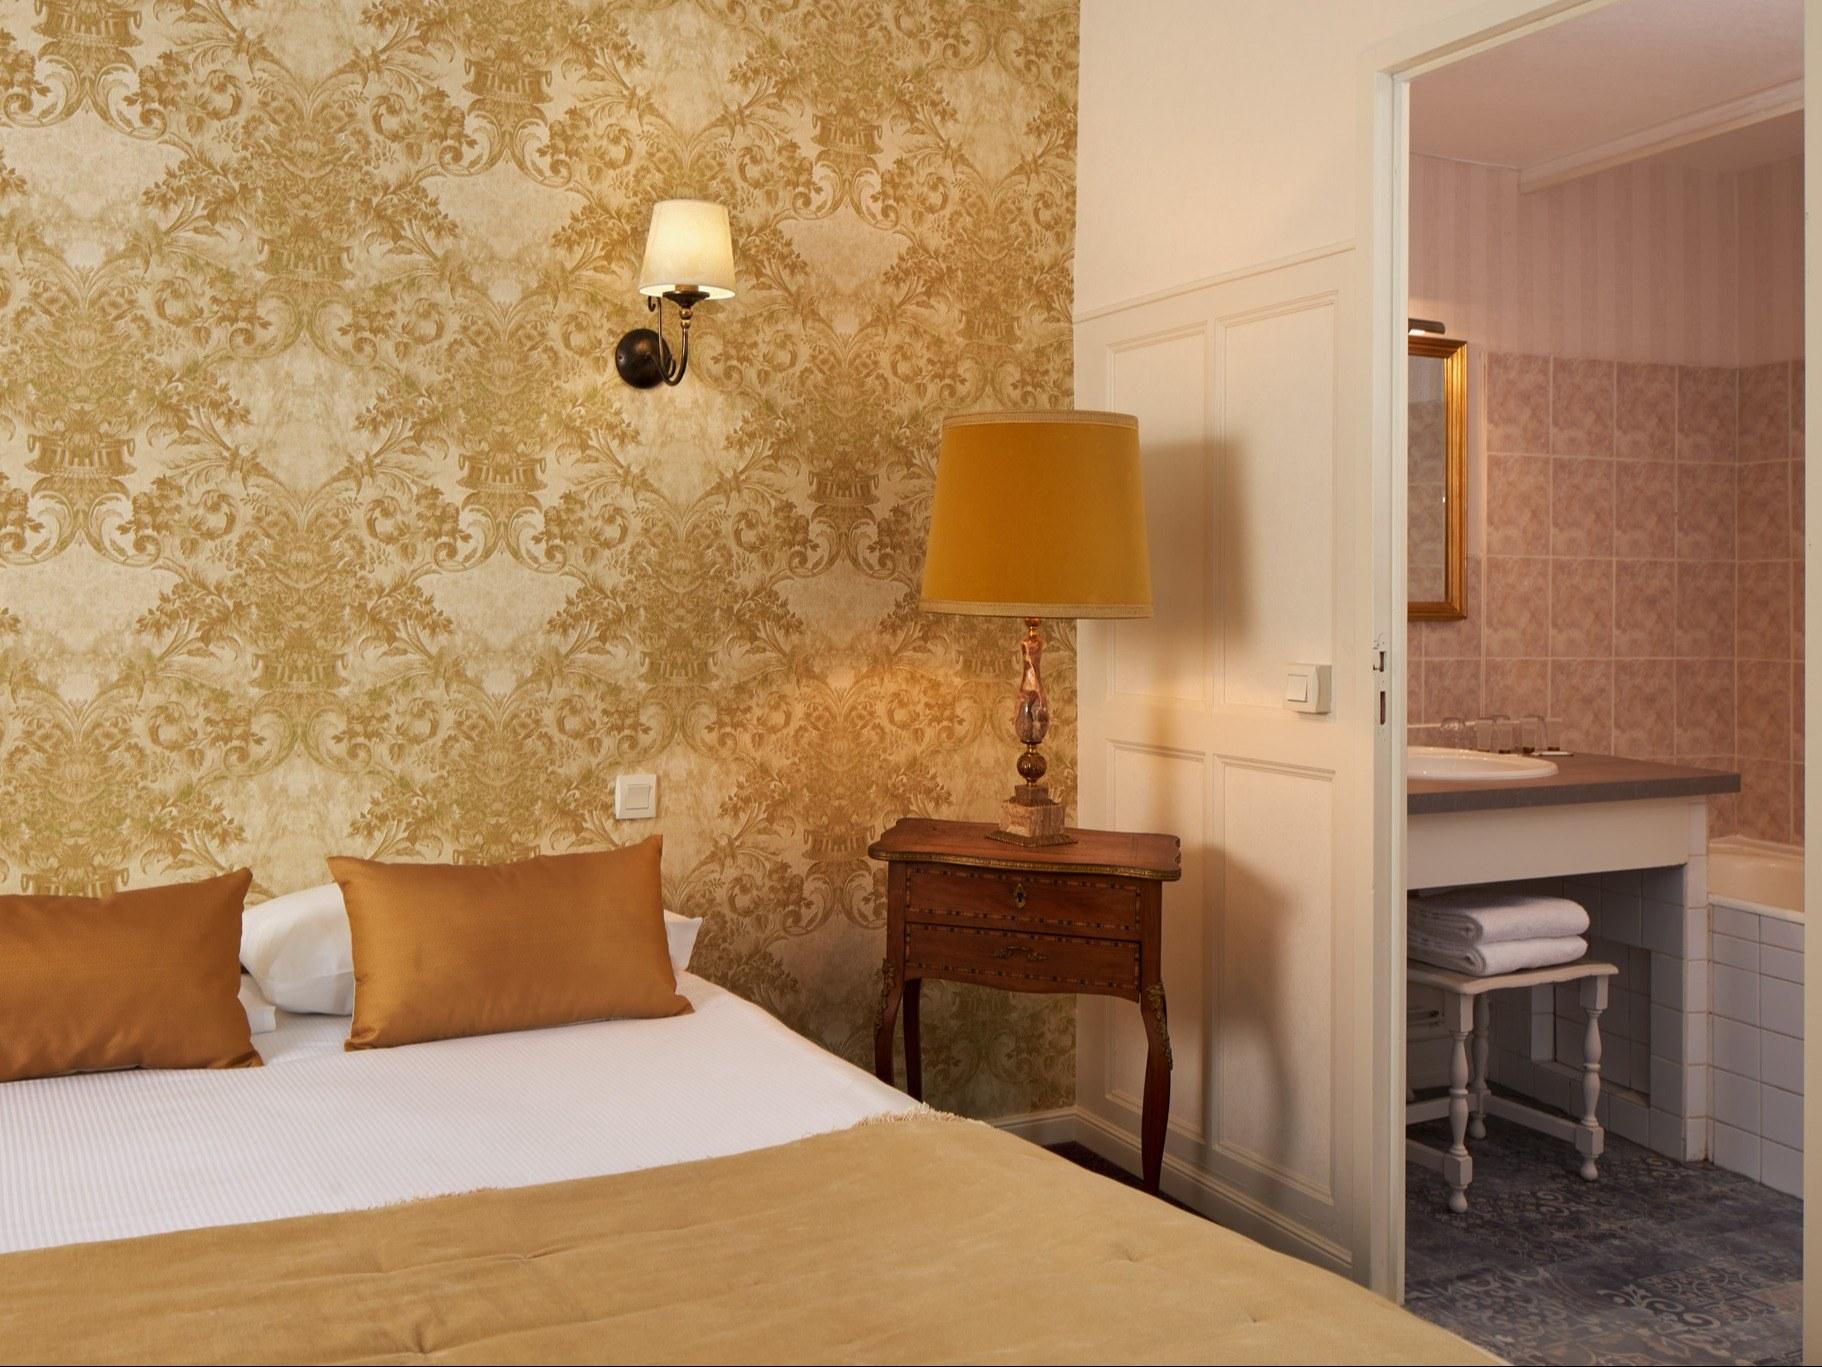 Hotel-blois-chambre--quadruple